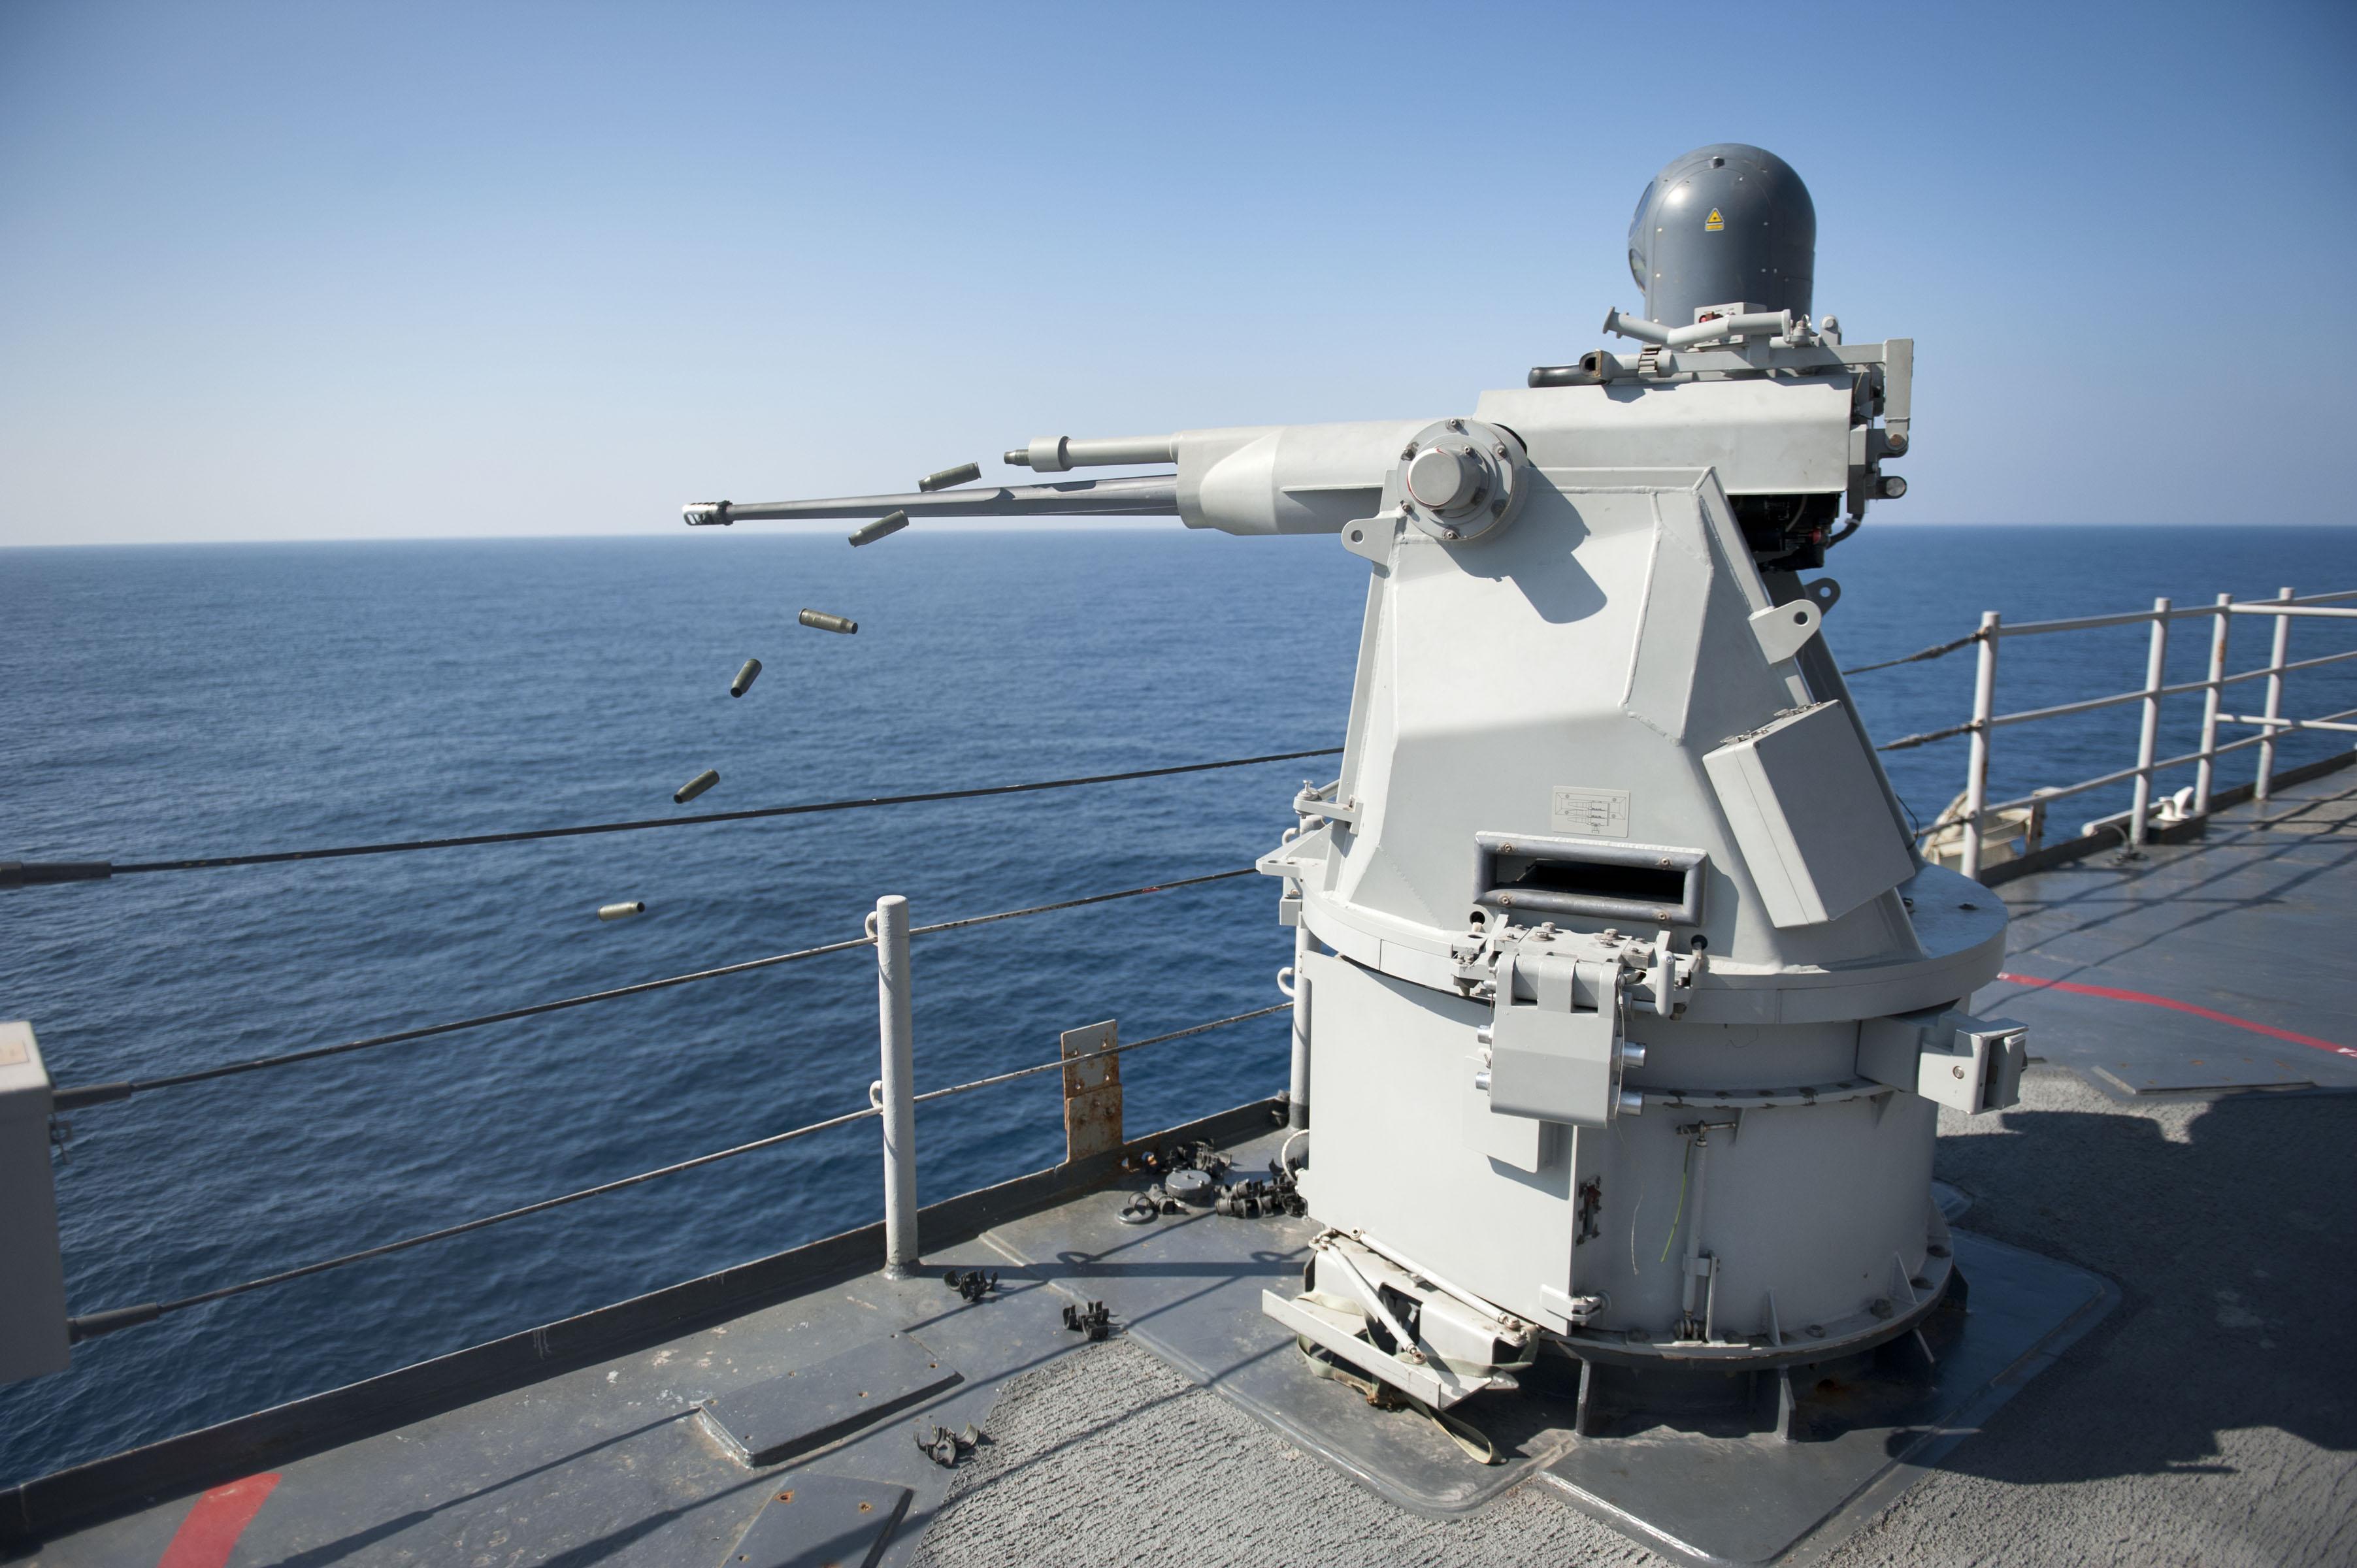 https://i2.wp.com/upload.wikimedia.org/wikipedia/commons/7/70/US_Navy_111231-N-KS651-967_A_Mk_38_MOD_2_25mm_machine_gun_system_aboard_the_amphibious_dock_landing_ship_USS_Pearl_Harbor_%28LSD_52%29_ejects_casings_d.jpg